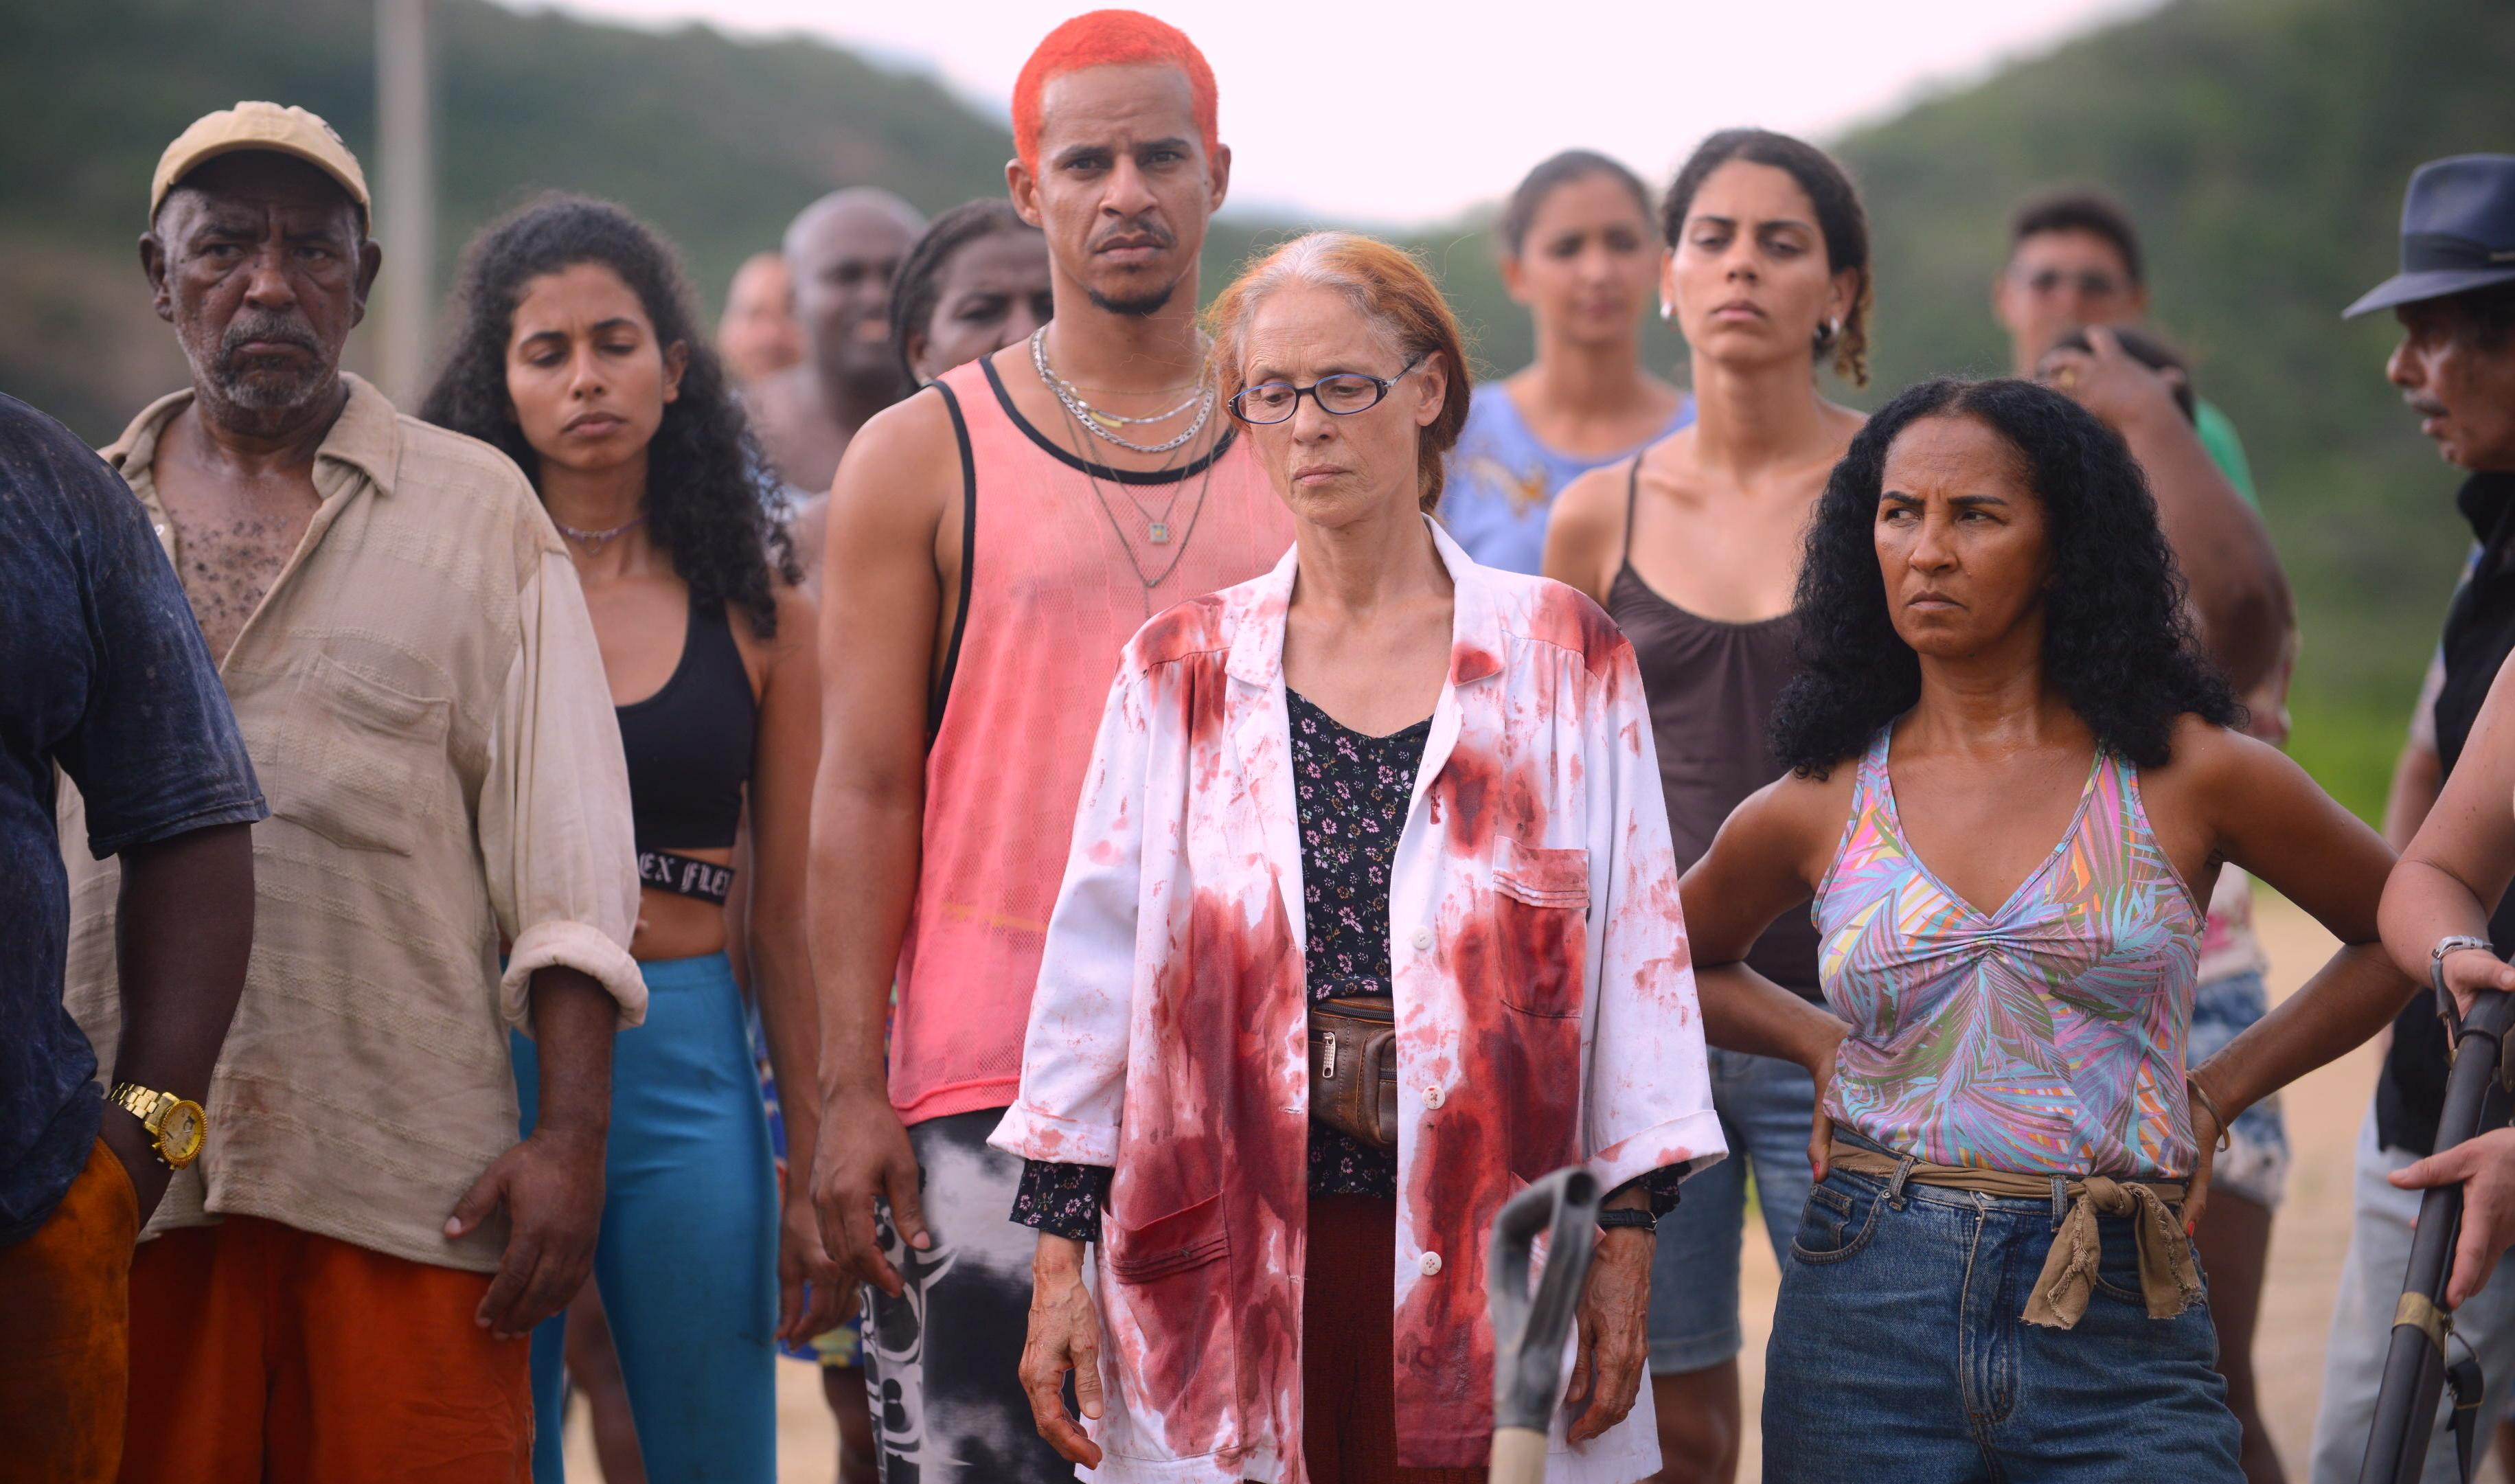 Sônia Braga (au centre) dans Bacurau de Kleber endonça Filho et Juliano Dornelles